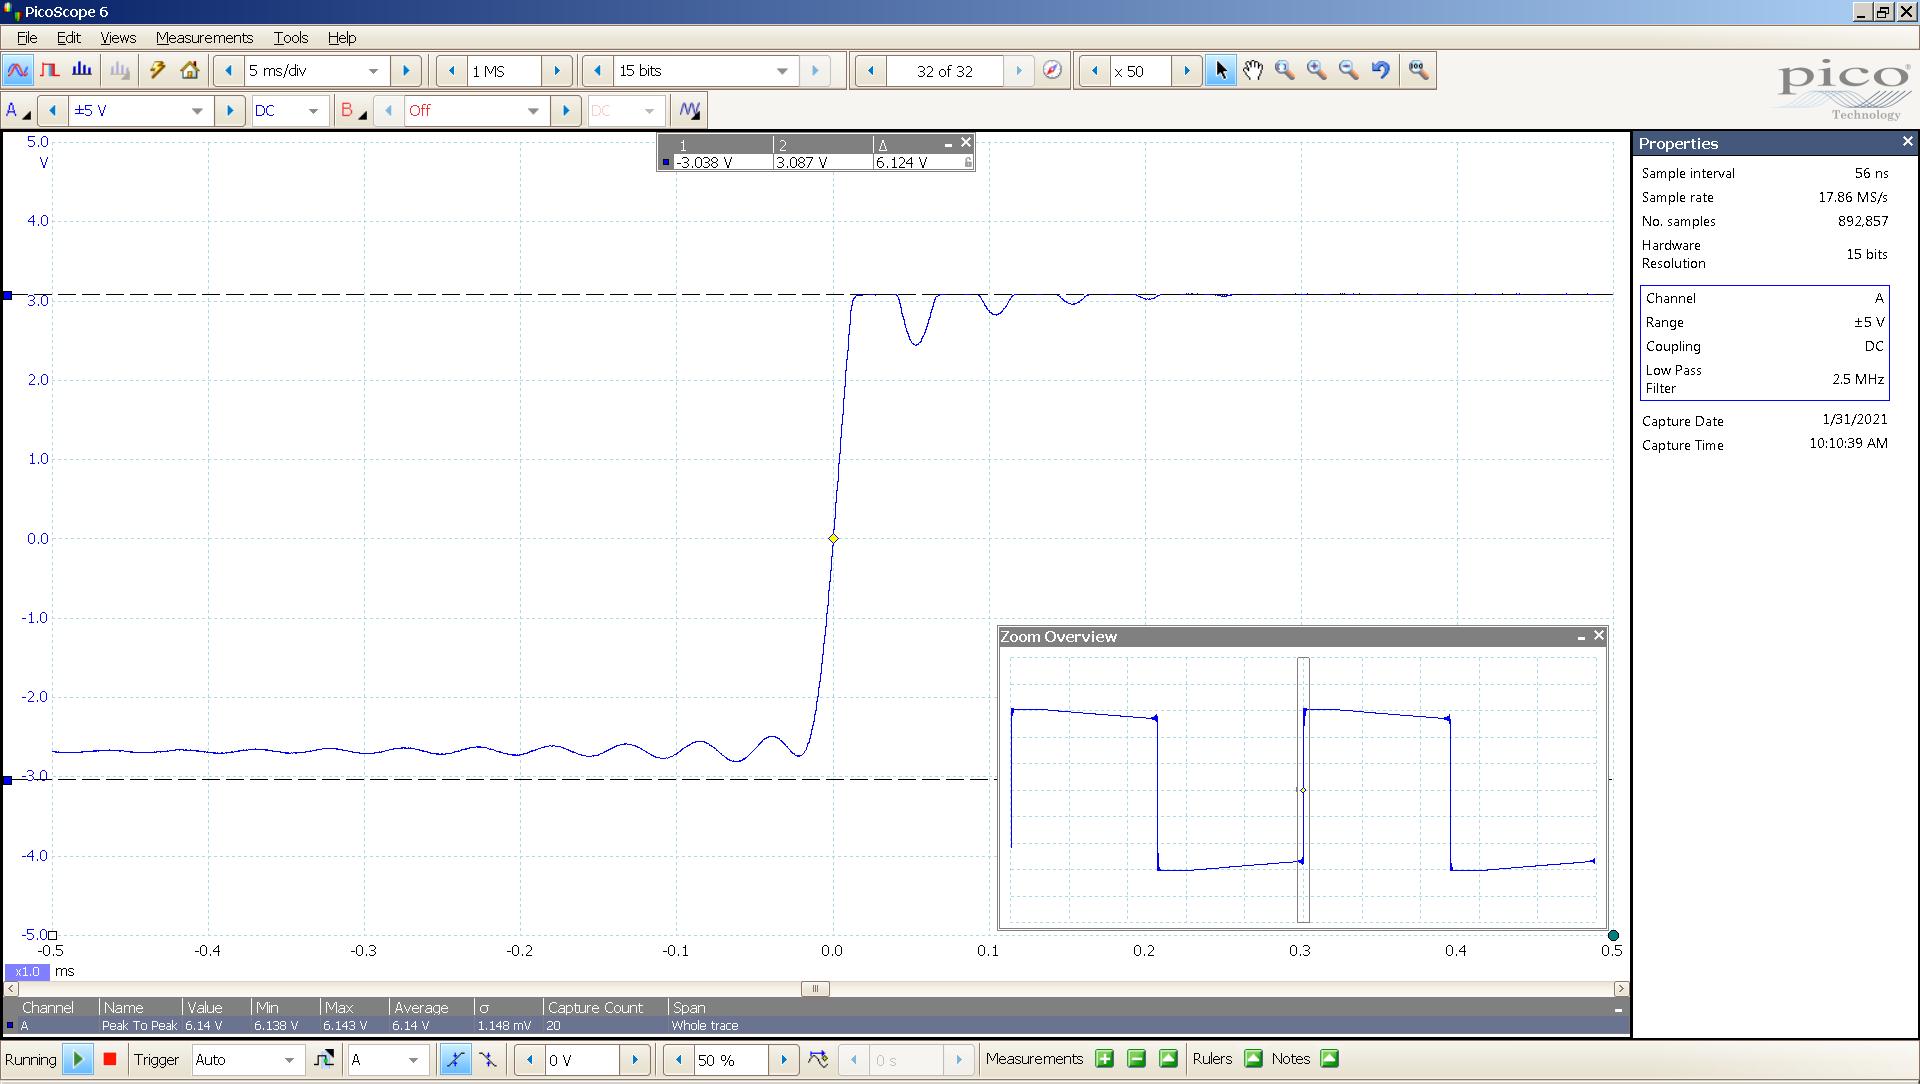 20210131-10 dac2541 40 Hz sqr 5847mVpp 5mS div 5MHz filter AES SE Mix 0 dBFS.png